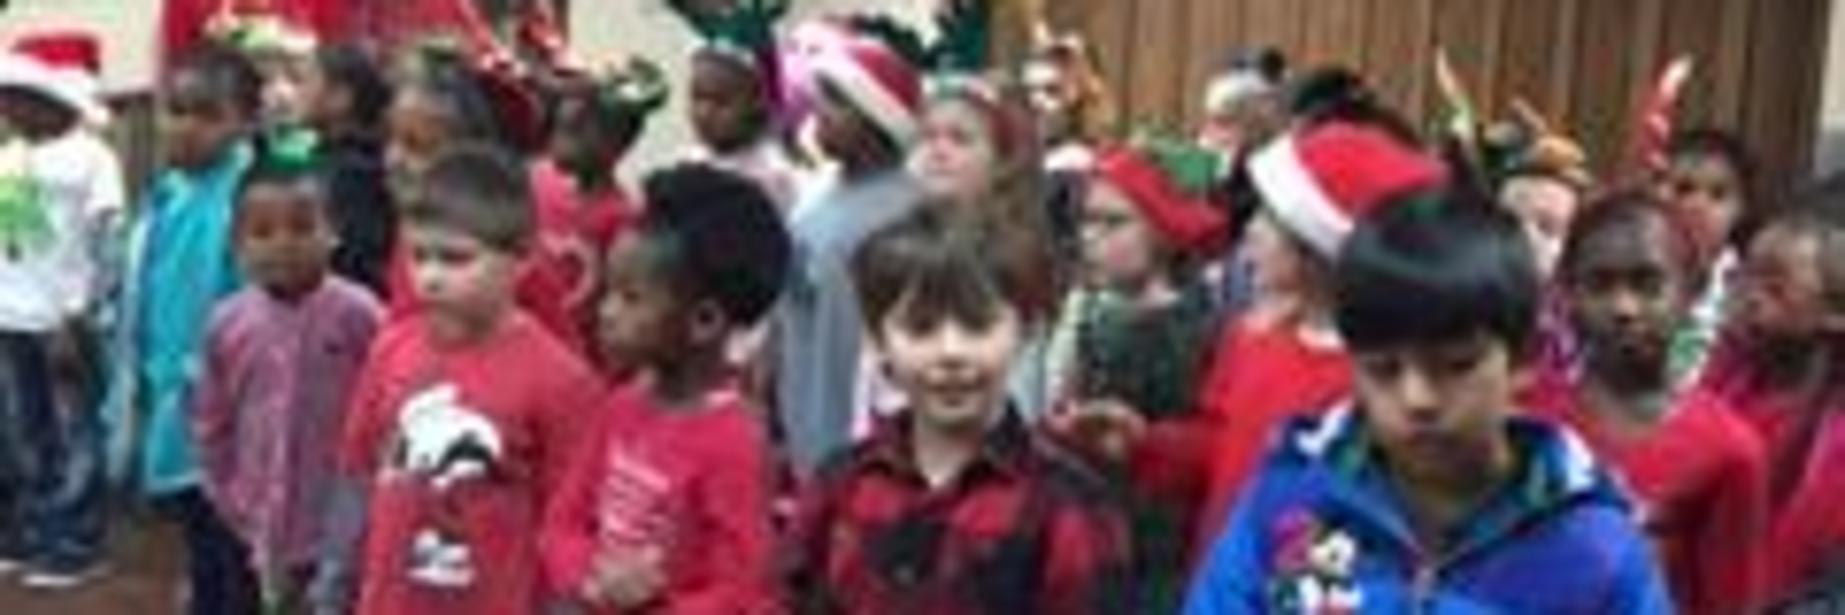 First graders caroling